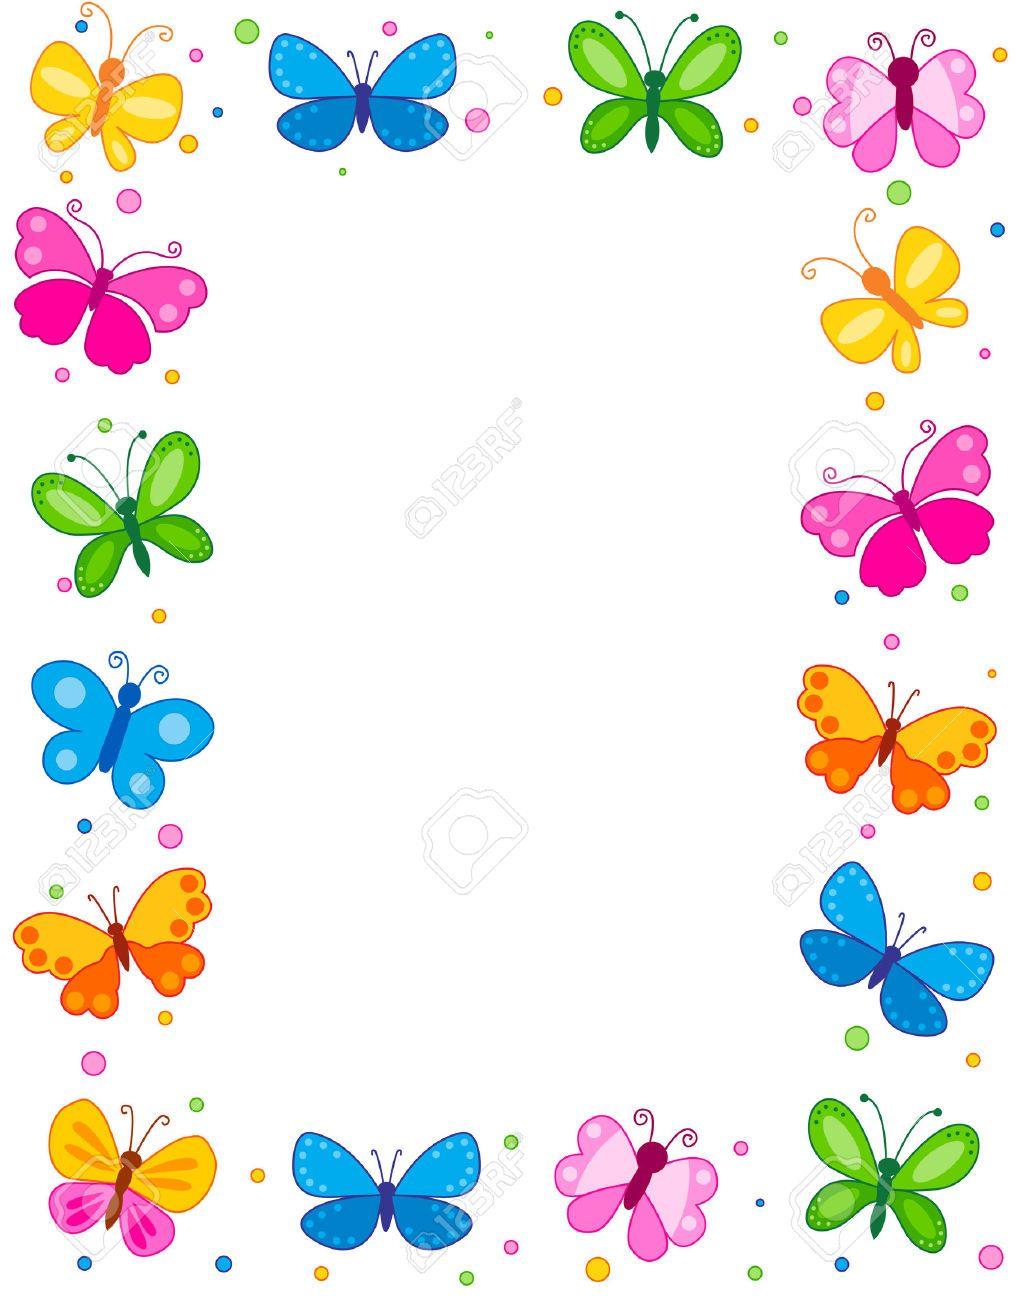 Cute frame illustrations google search cute frames butterfly frame printable border - Monster high wallpaper border ...